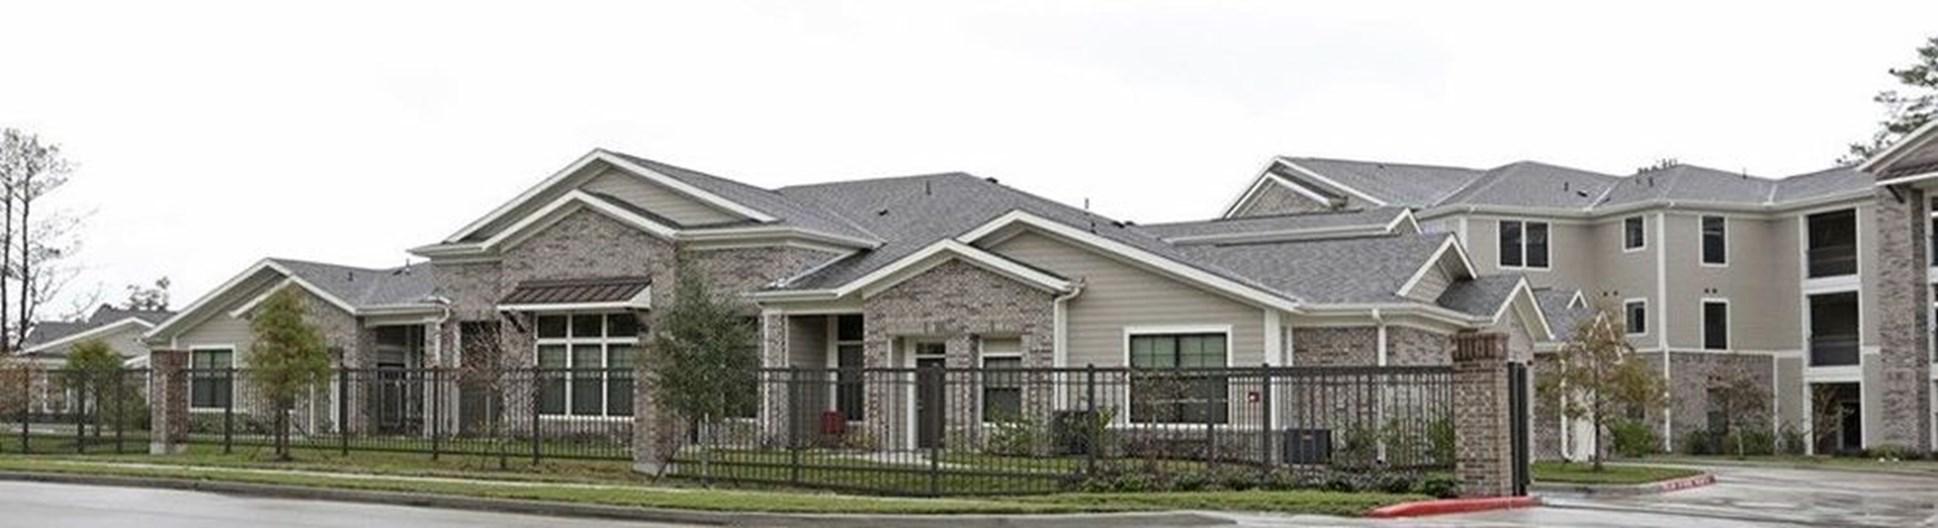 Riverbrook Village Apartments